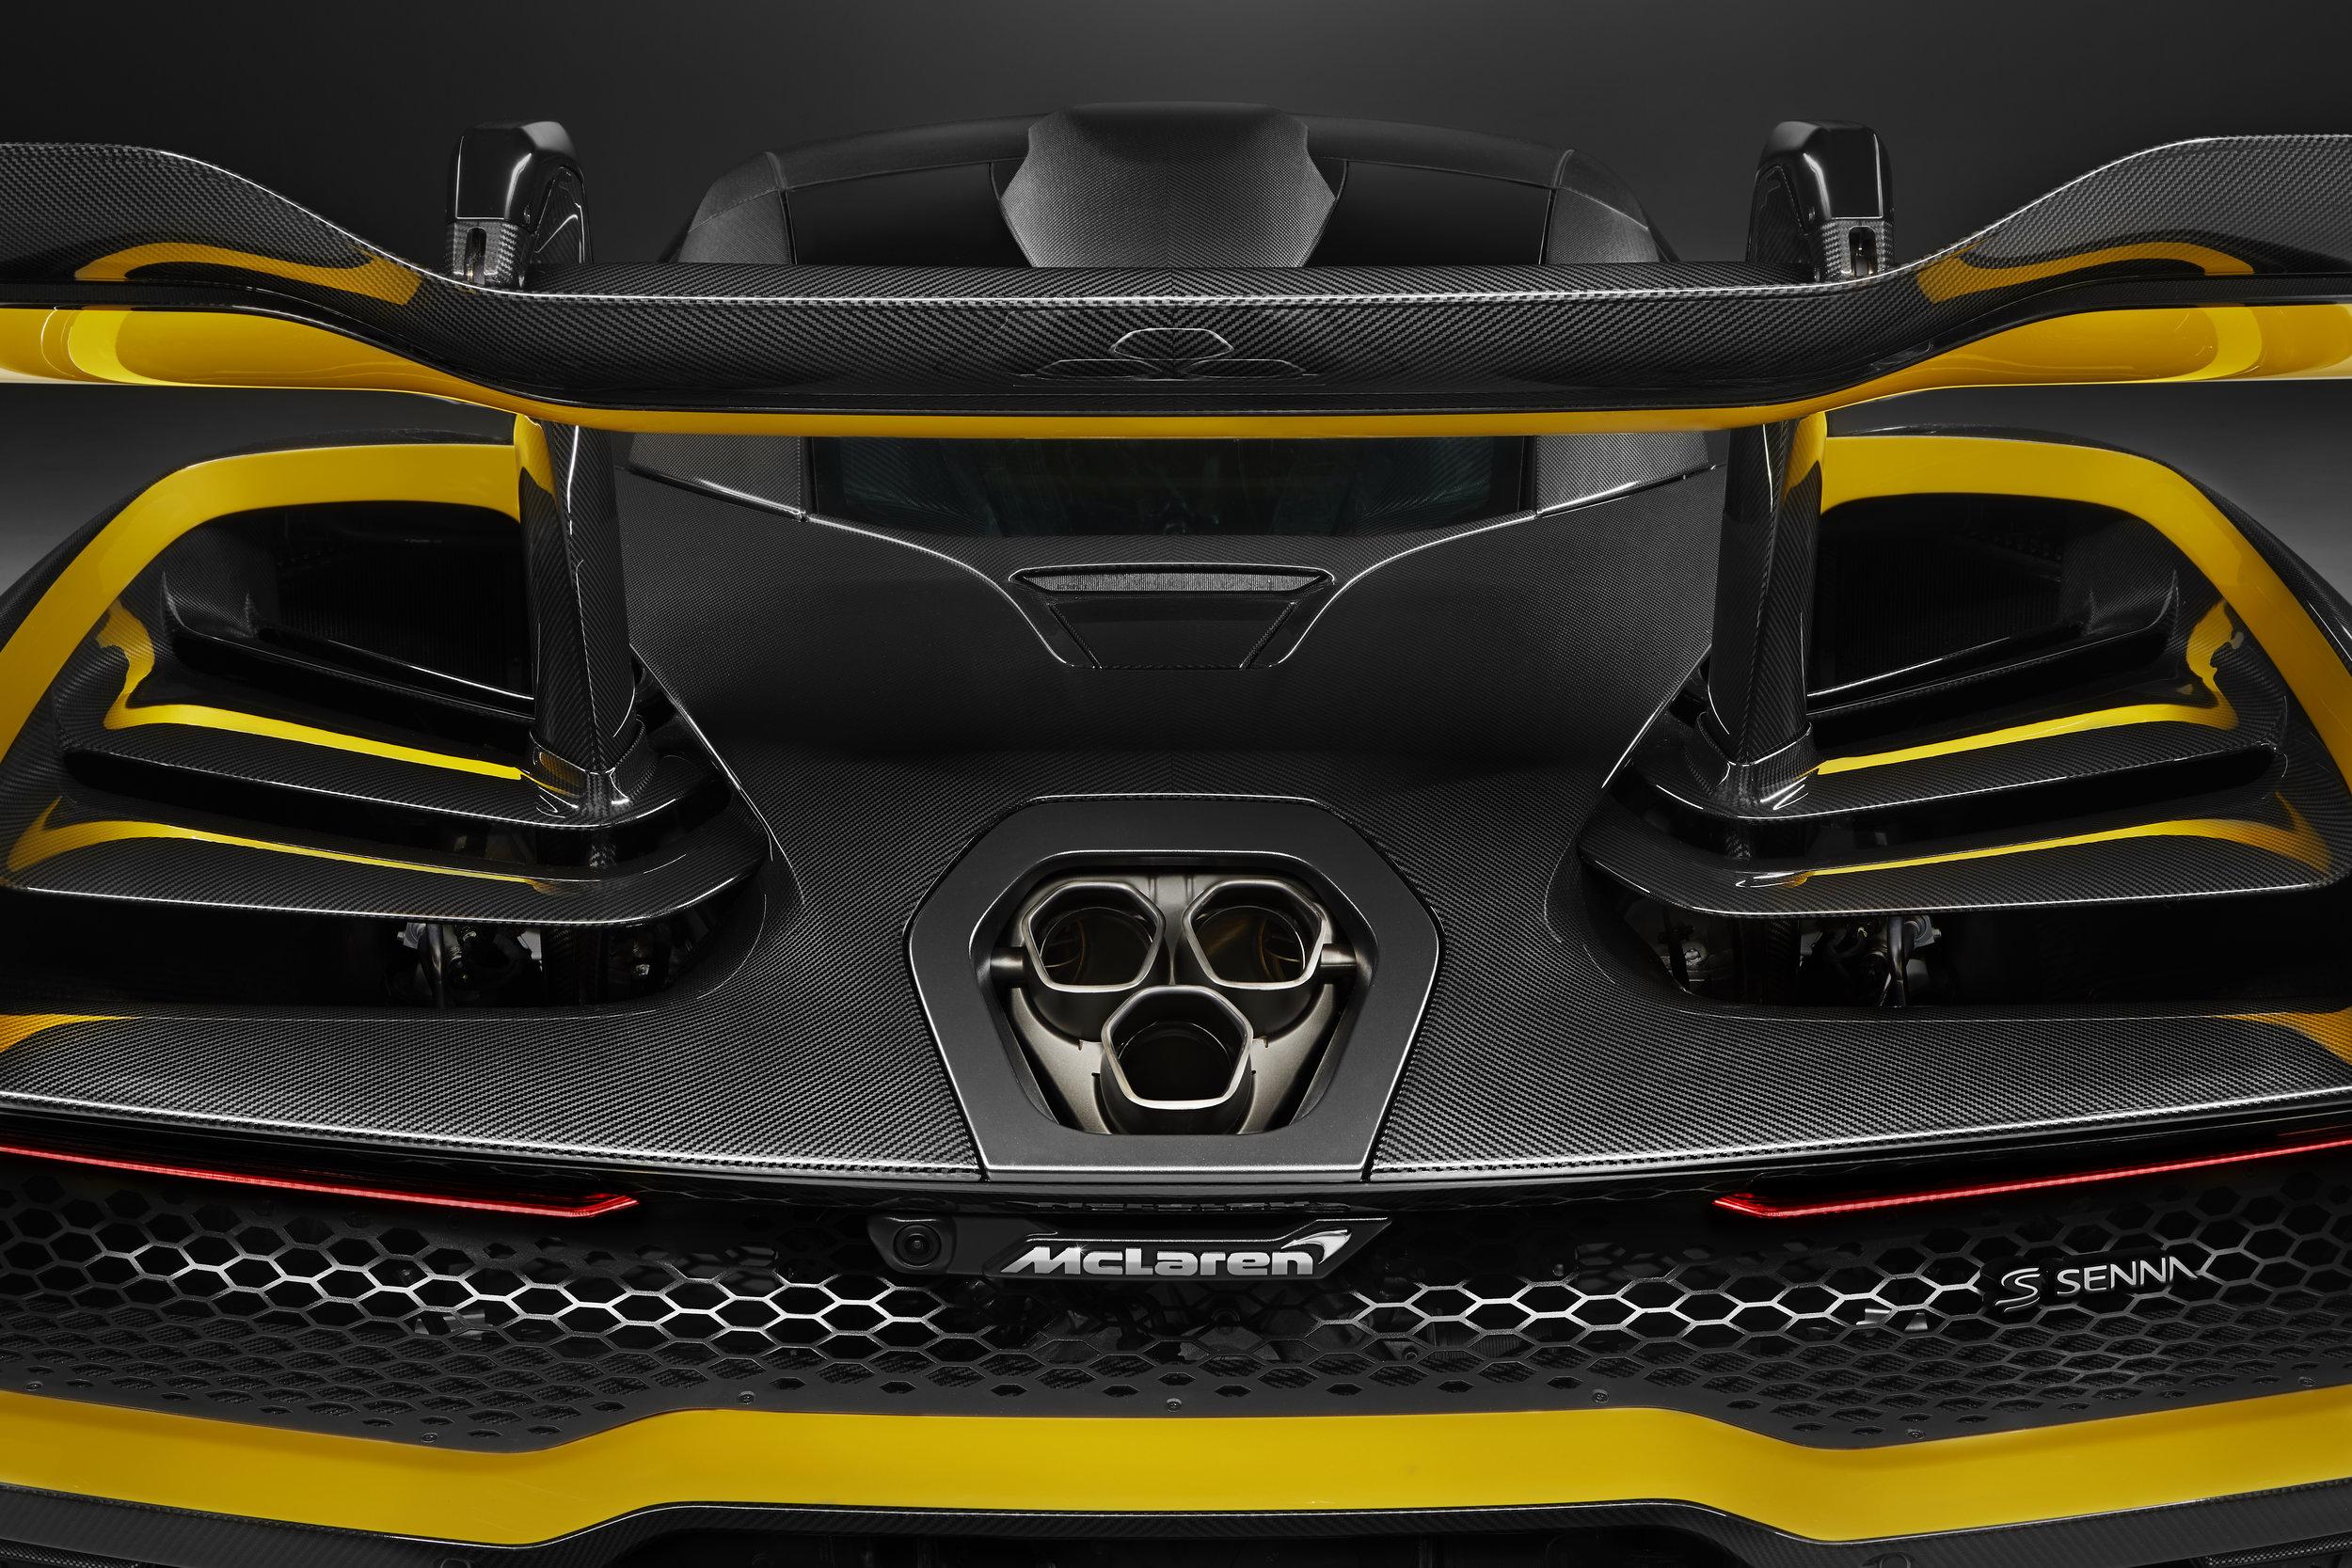 8957McLaren-Senna-Carbon-Theme-by-MSO_07.jpg